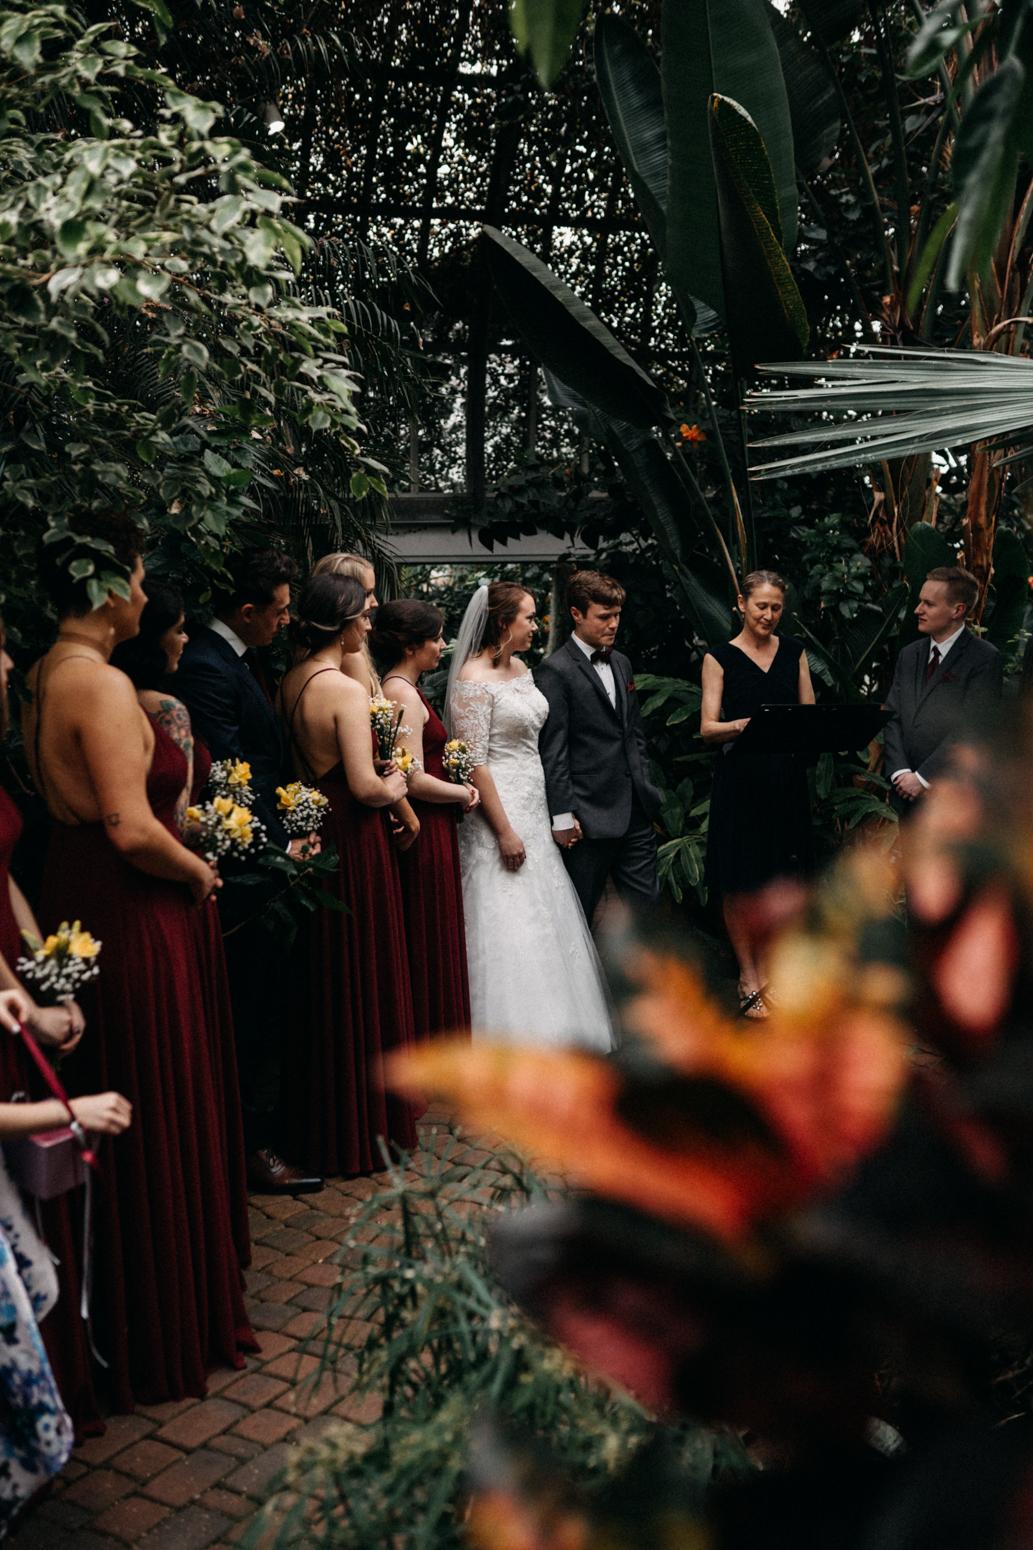 Rochester, NY Wedding Photographer (44 of 96).JPG